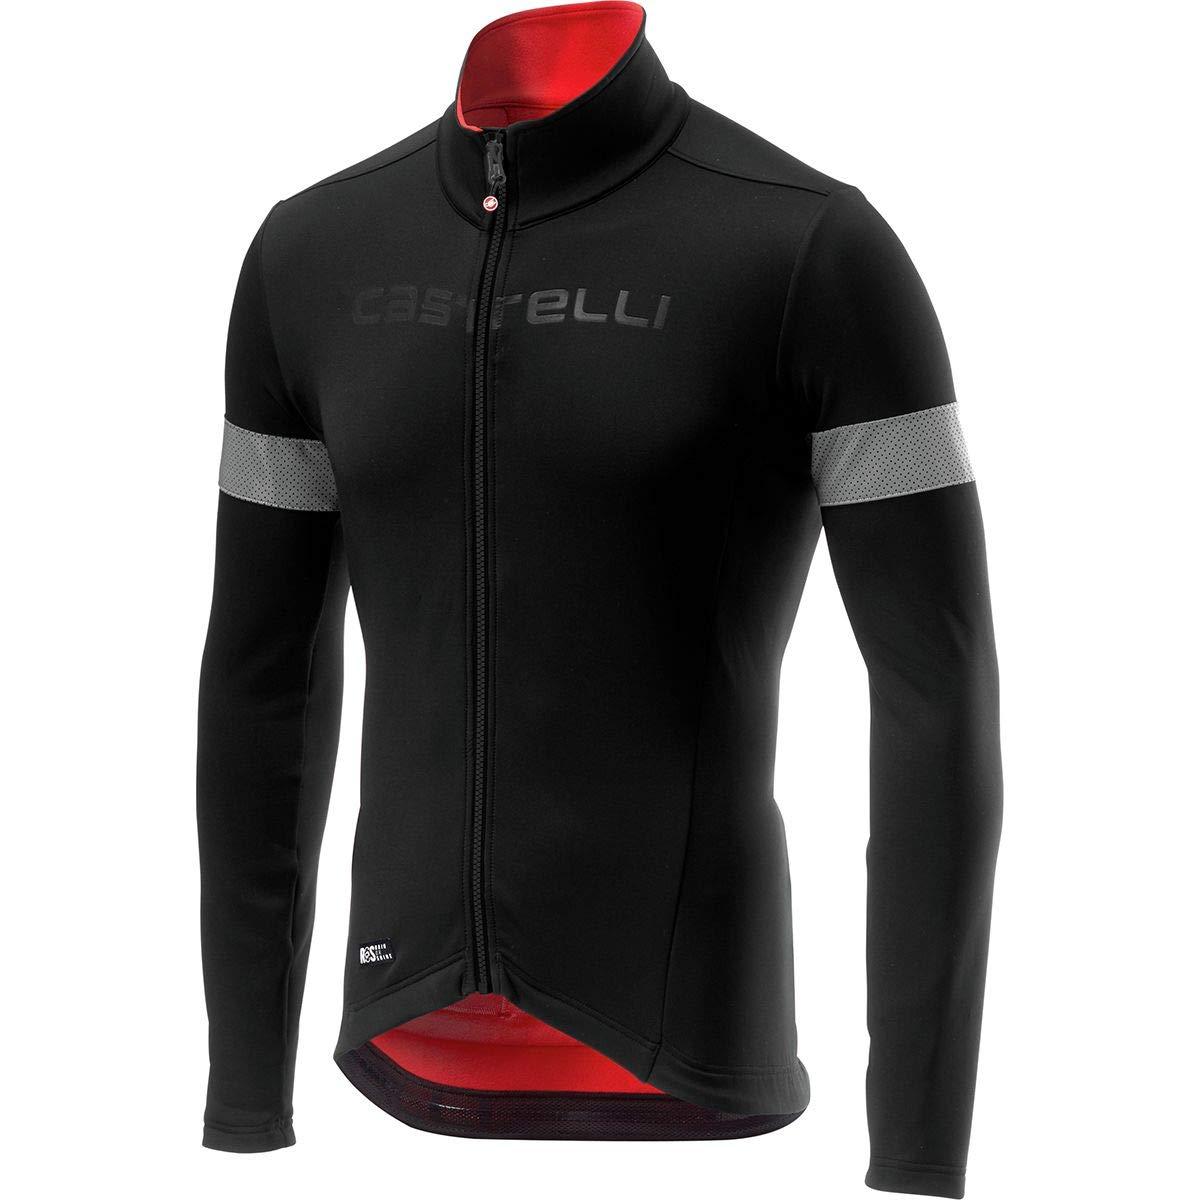 Castelli Nelmezzo ROS Jersey - Men's Black/Red, XXL